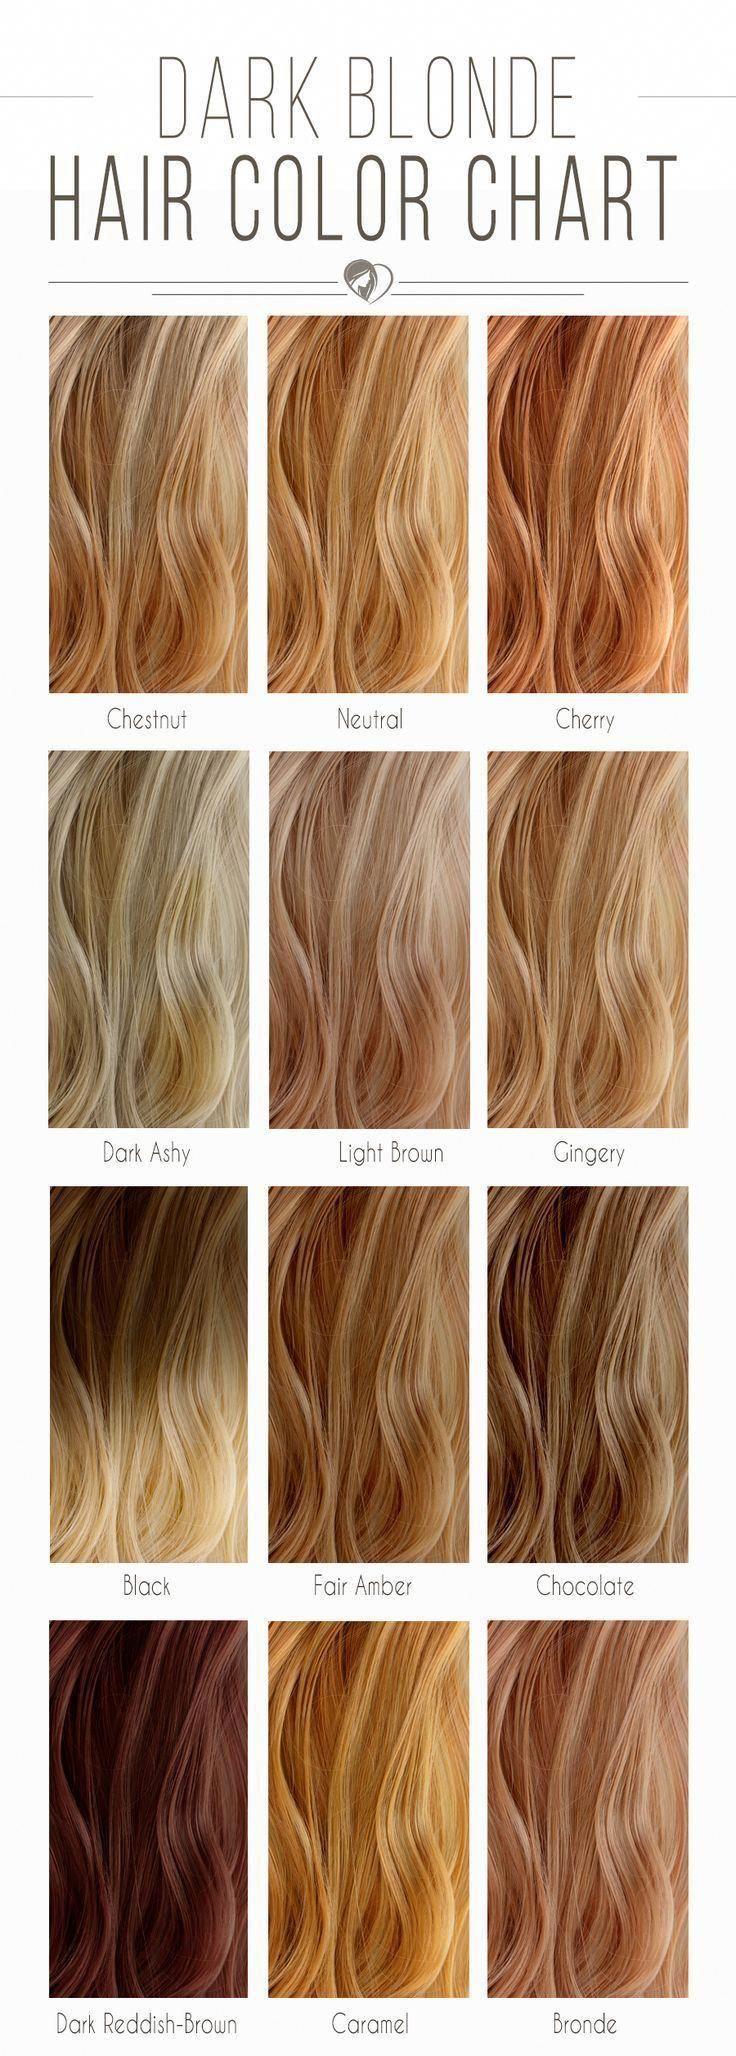 Fab Dark Auburn Balayage Darkauburnbalayage With Images Blonde Hair Color Chart Hair Color Chart Dark Blonde Hair Color